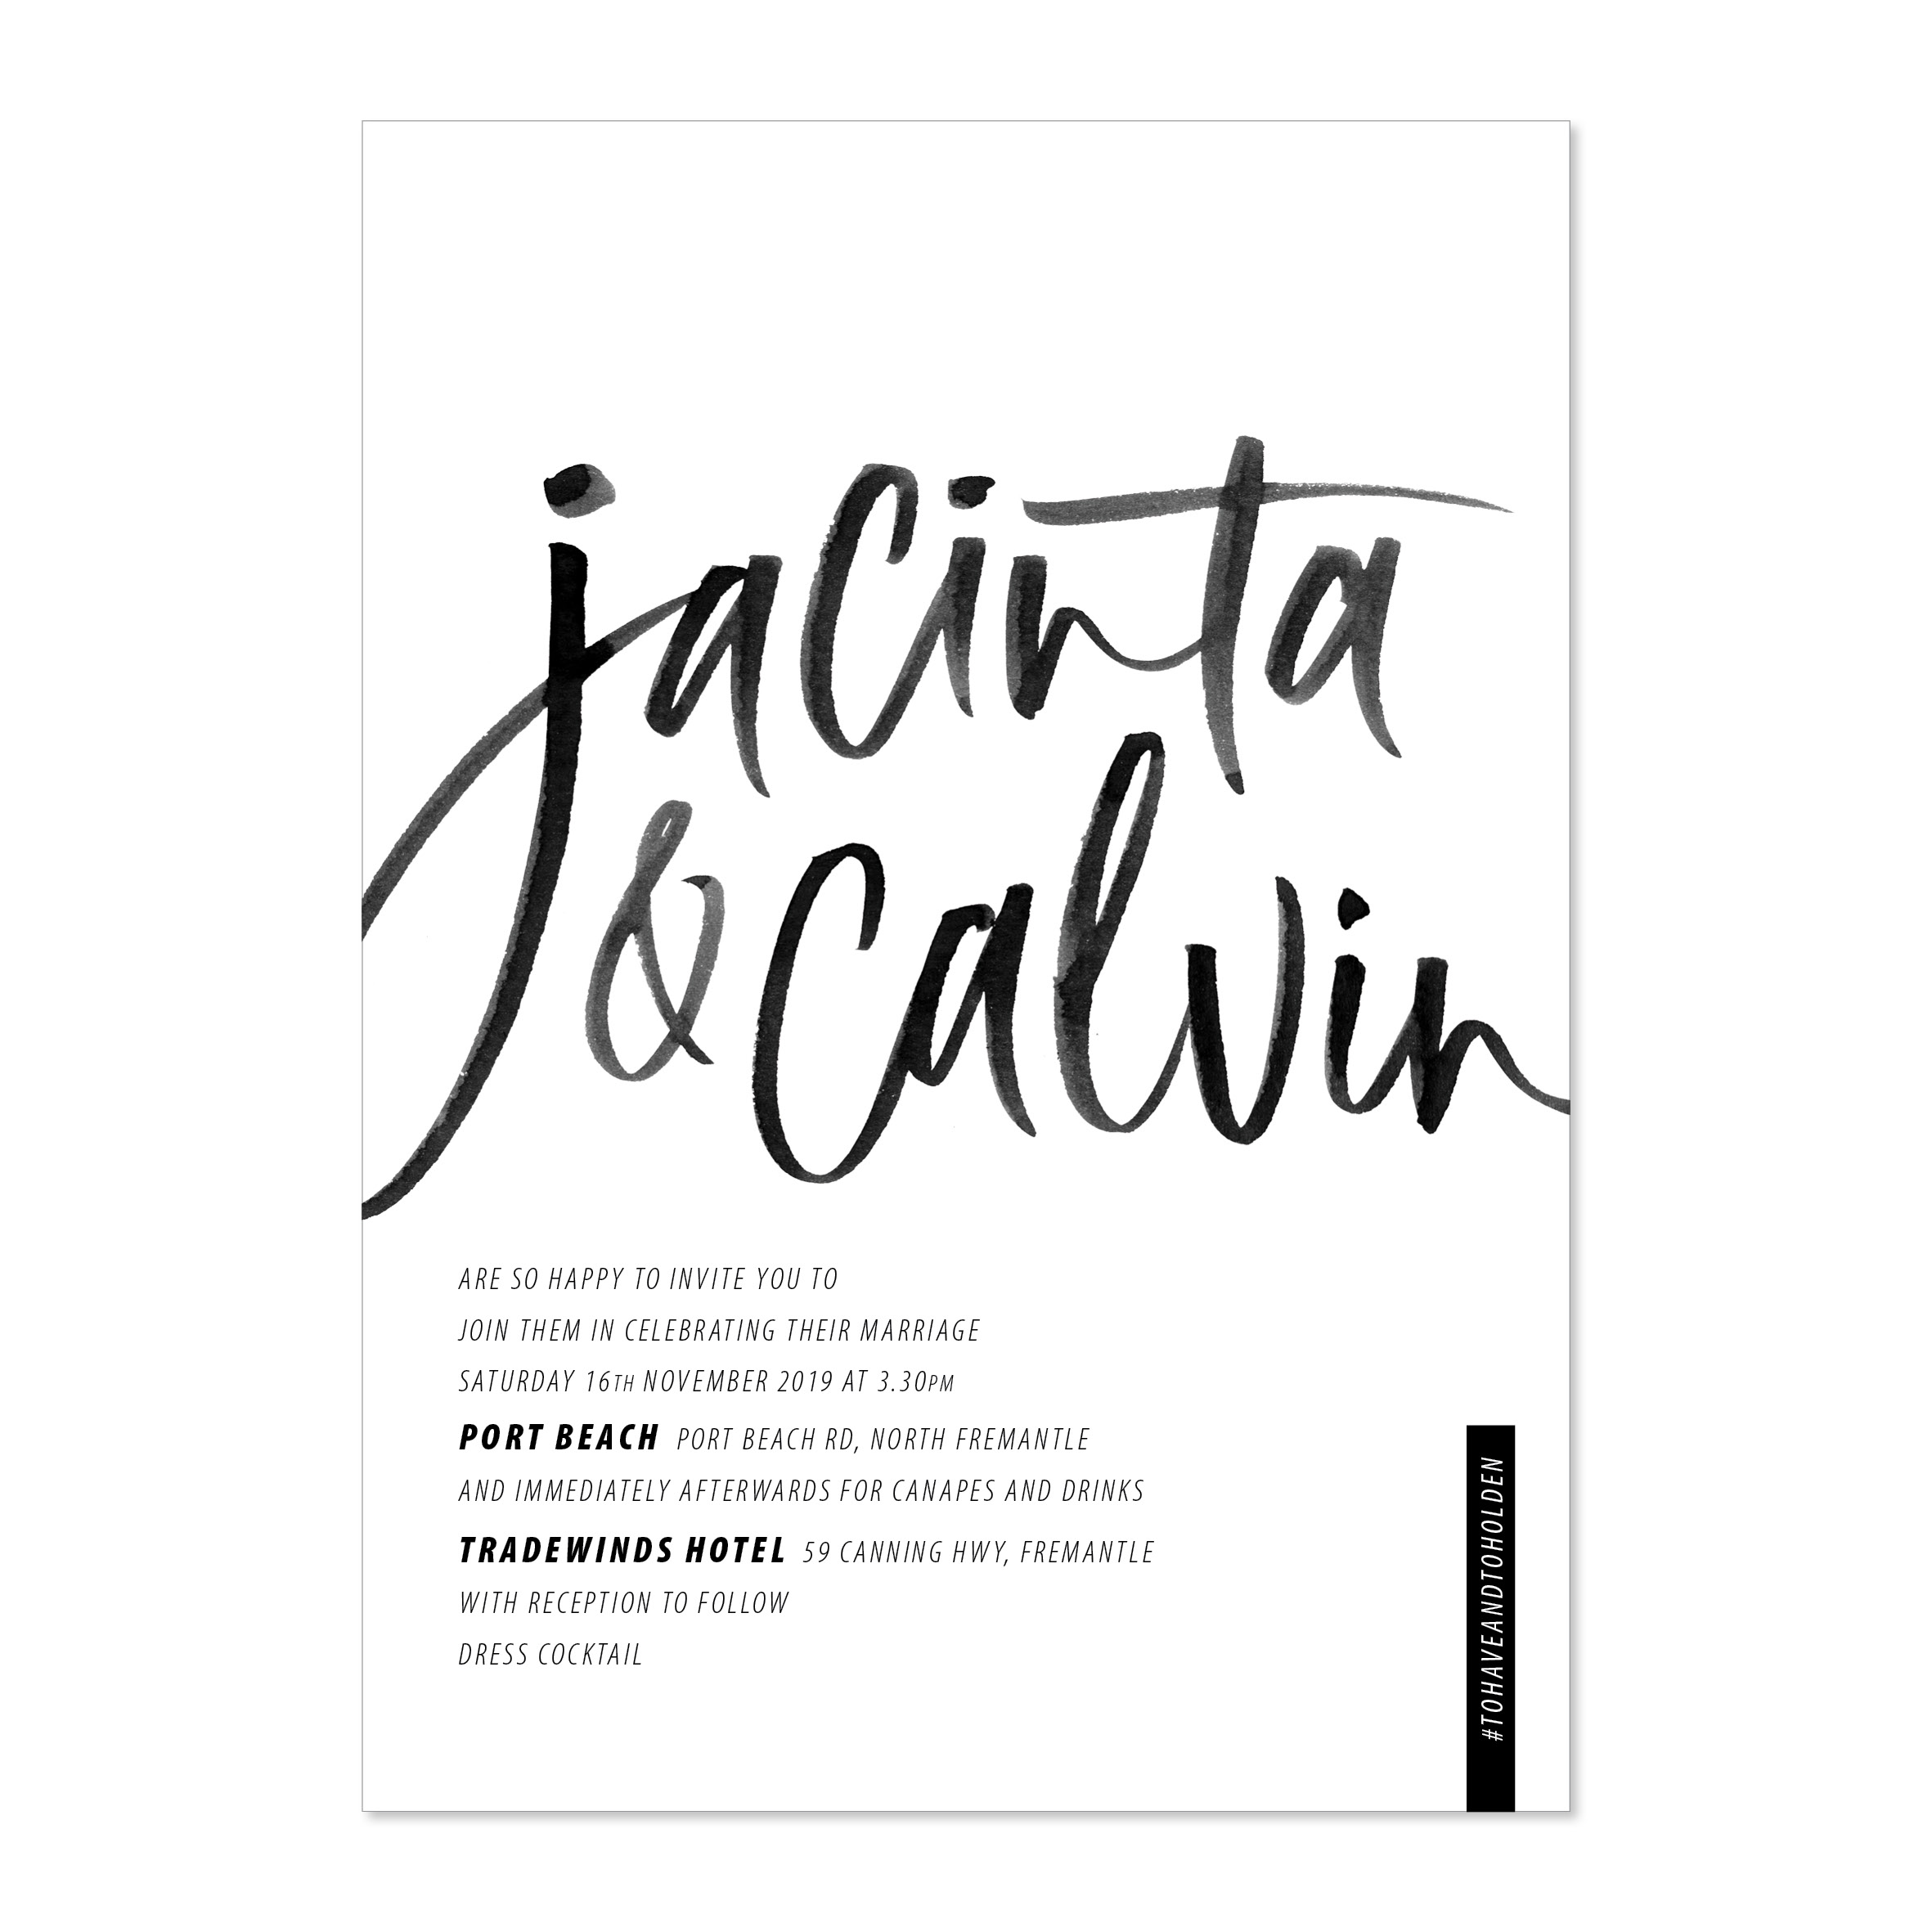 jacinta & calvin1b.jpg